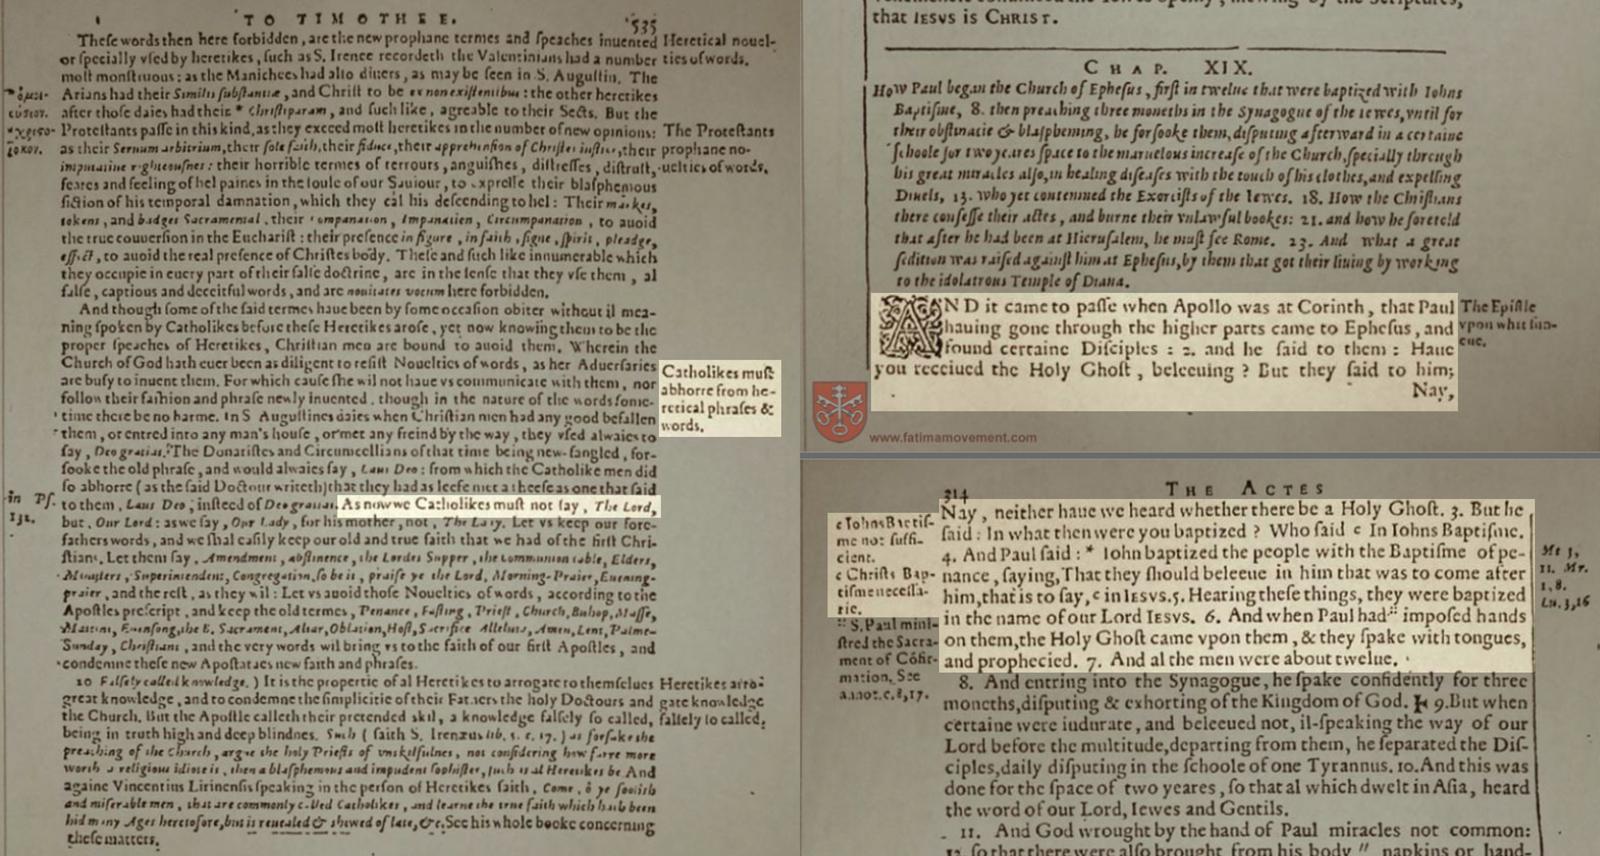 The Original 1582 Douay Rheims